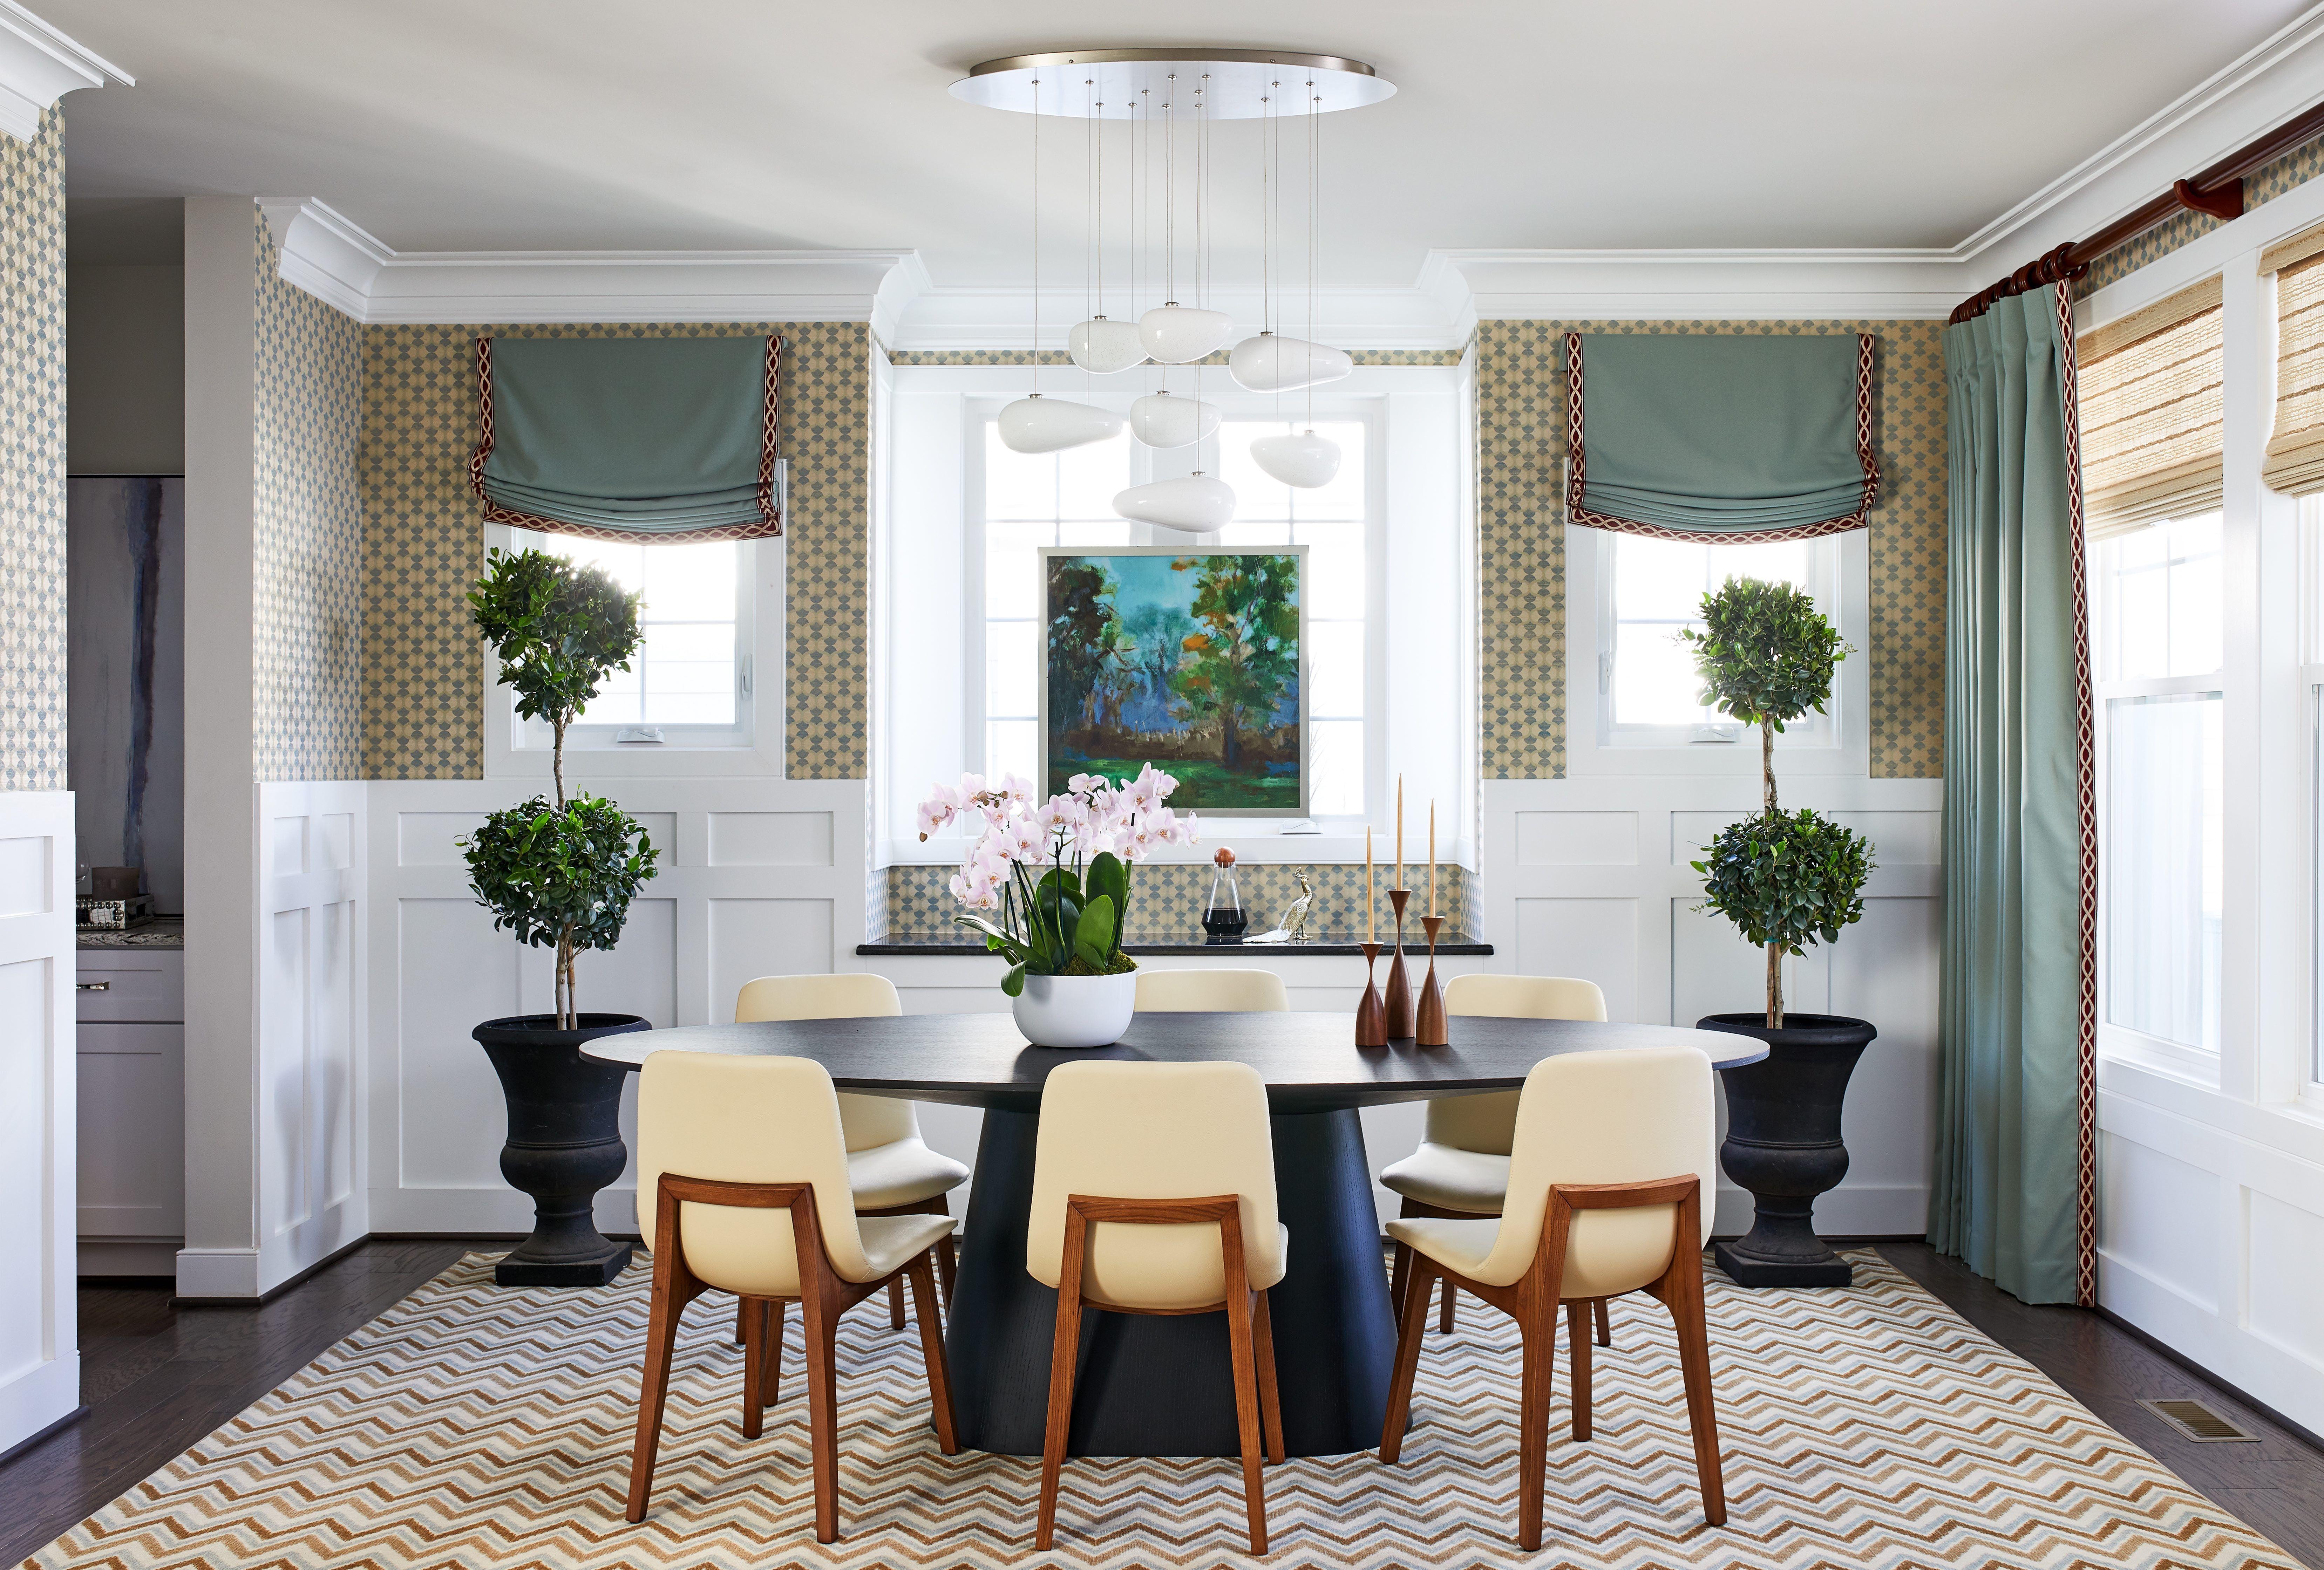 Wainscoting Grasscloth Chandelier Geometric Zig Zag Rug Walls Blue Drapes Shade Elegant Home Decor Boston Interiors Boston Interior Design